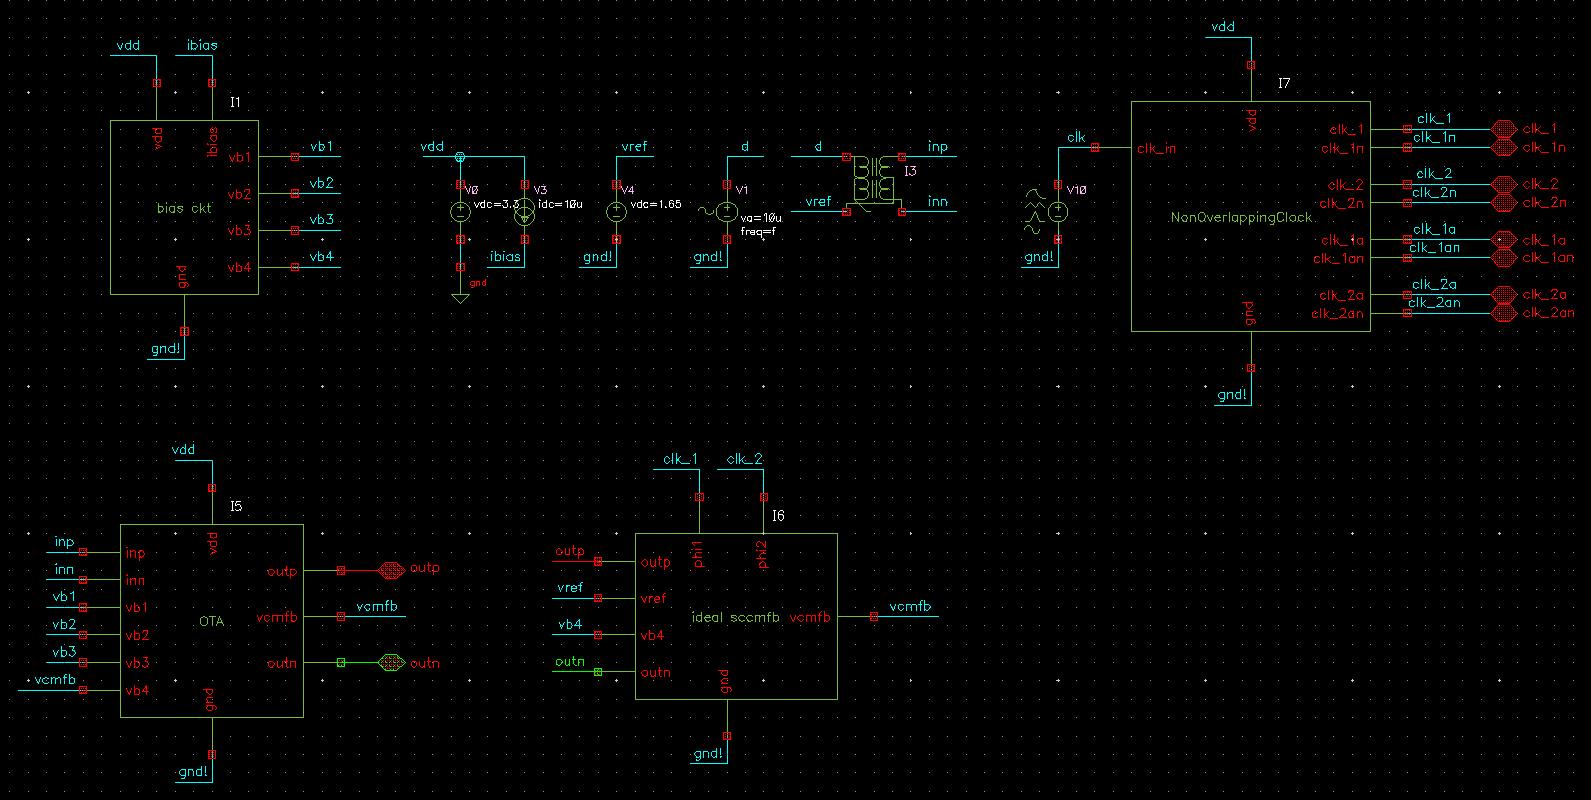 schematic_005.png